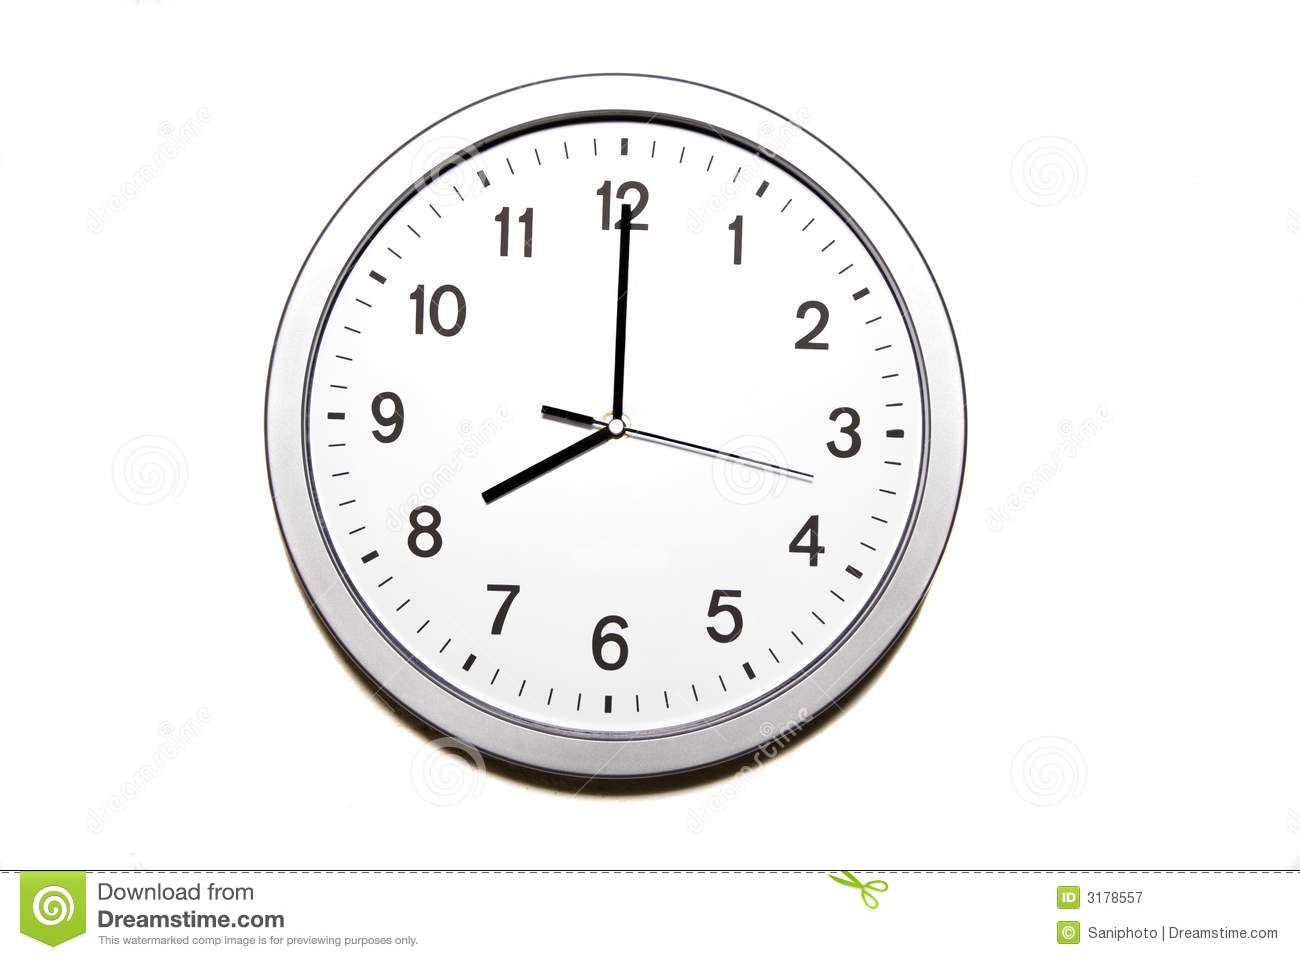 clipart 8 o'clock - photo #12